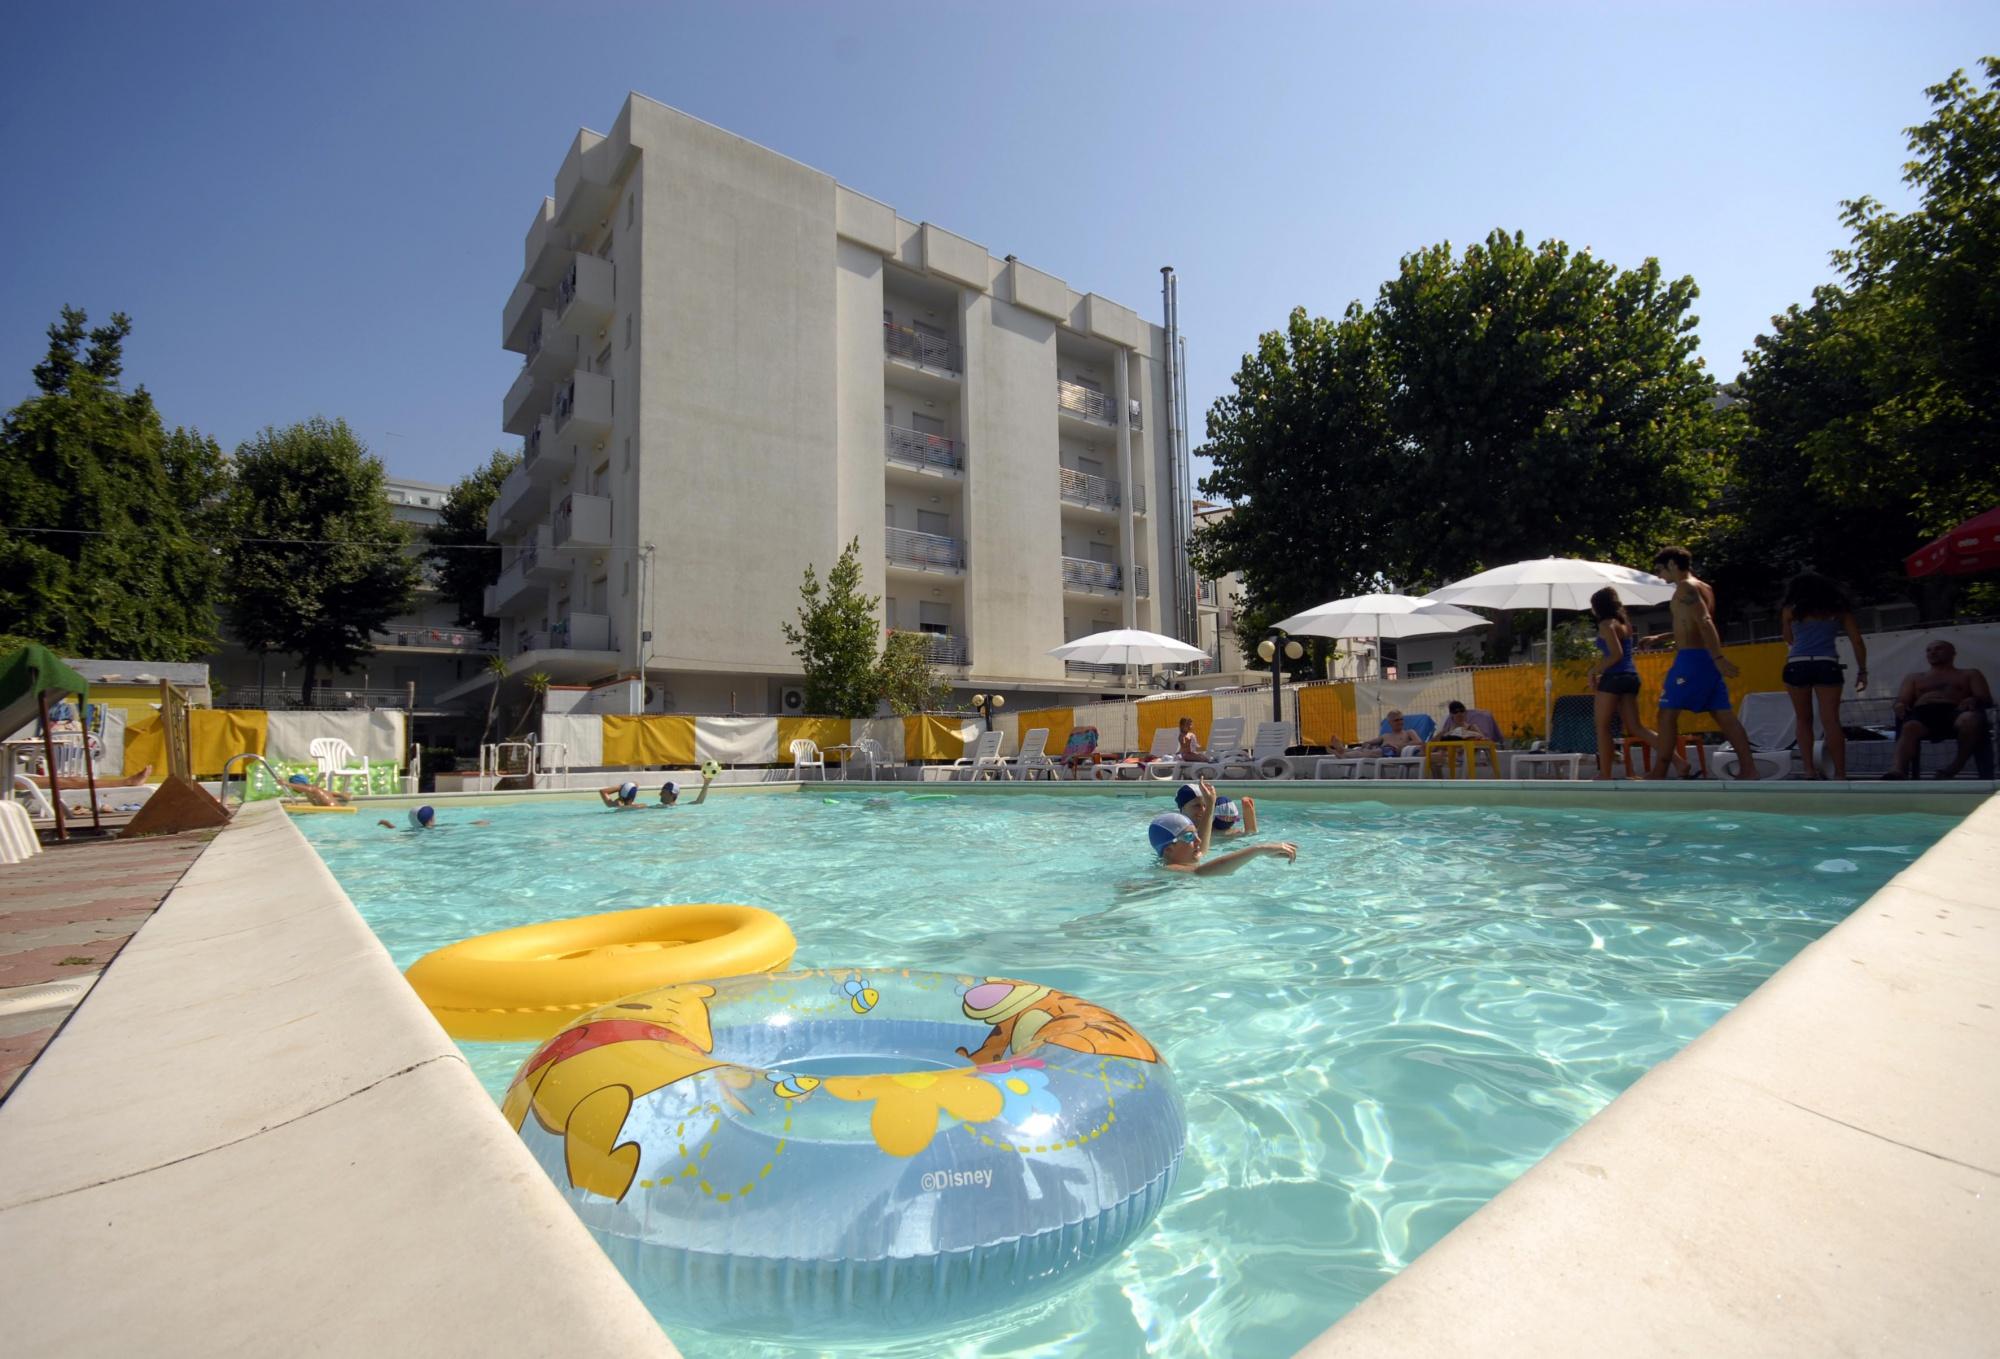 Angebot family hotel im juli 3 sterne hotel in rimini for Pool im angebot